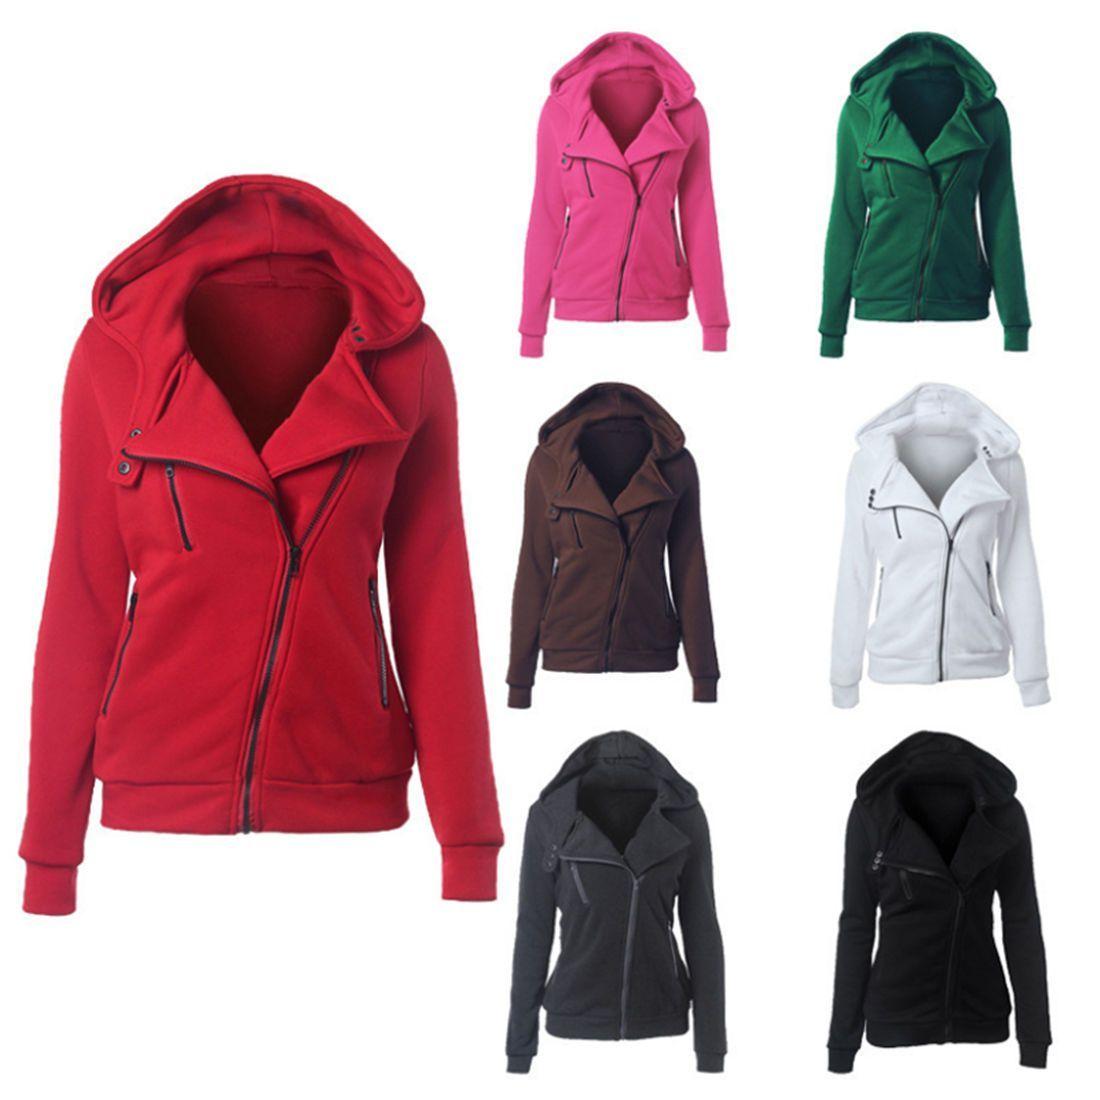 c7928b00b56 Women S Casual Zipper Hoody Hoodies Long Sleeve Sweatshirt Pullover Jumper  Coat